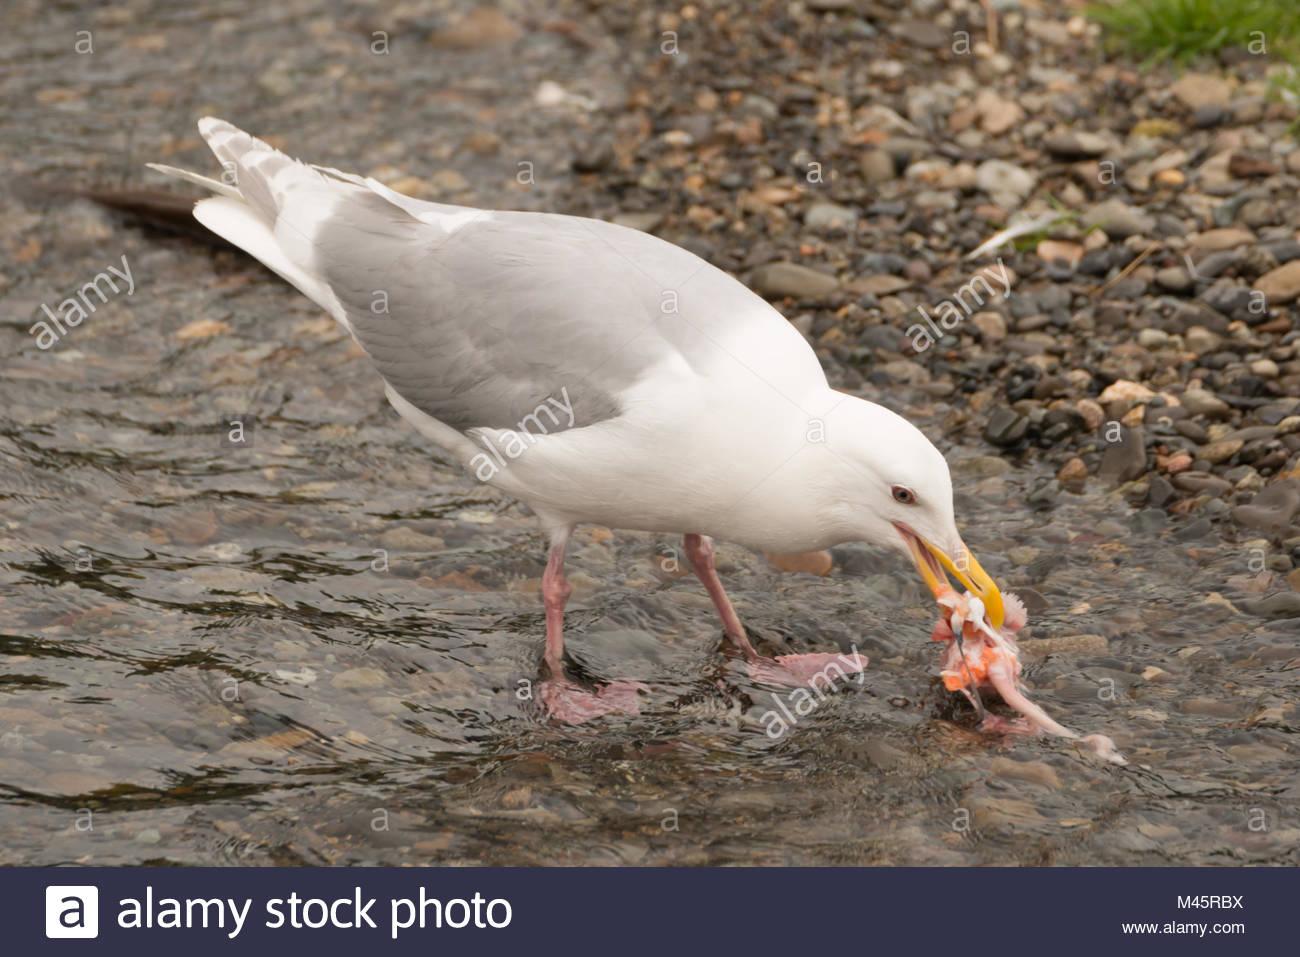 Seagull pecking at salmon chunk in shallows Stock Photo